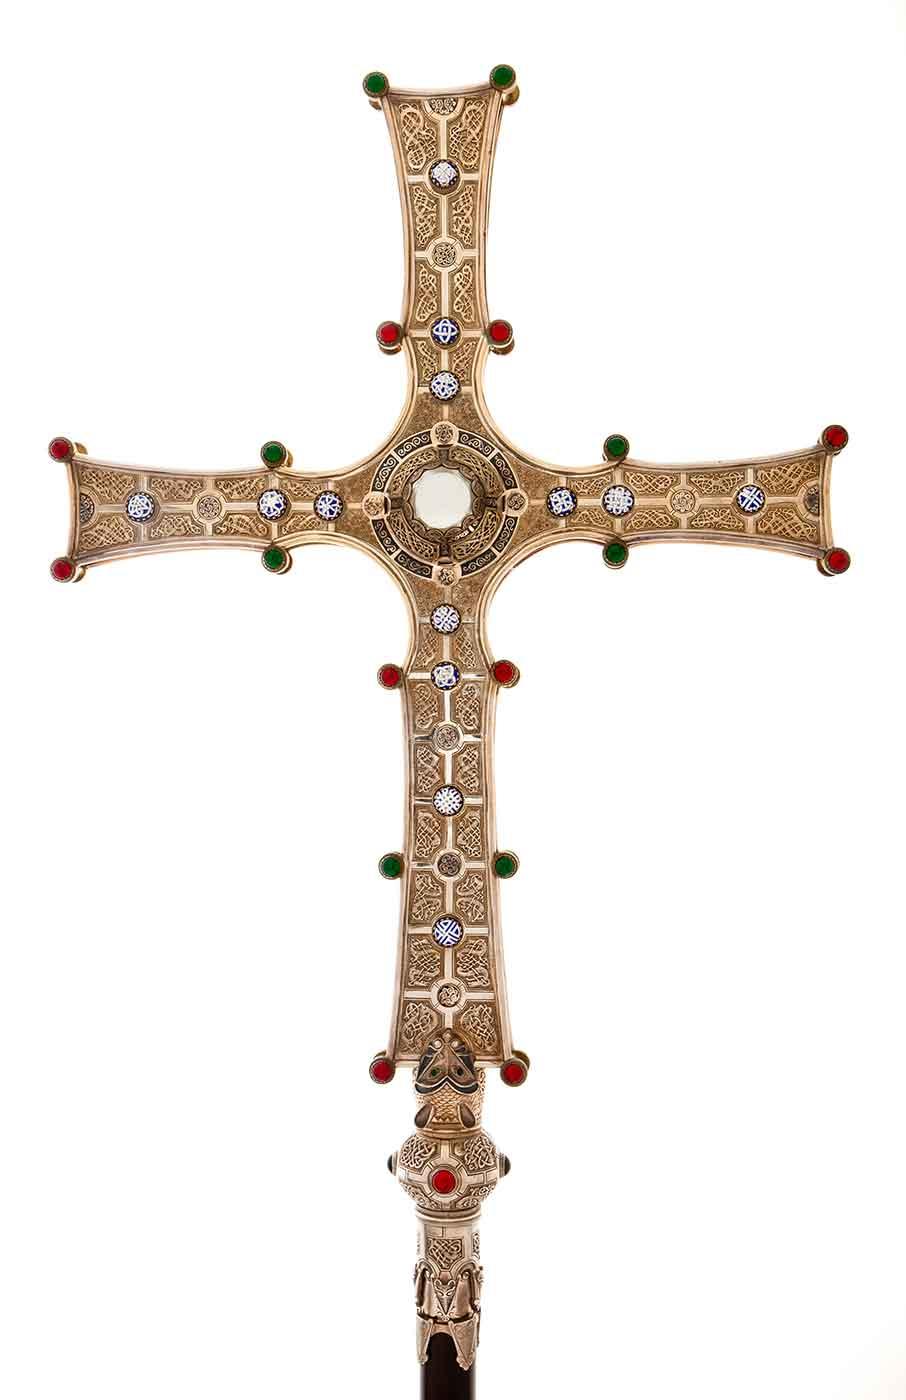 Golden cross with ornate Celtic design and gemstones.